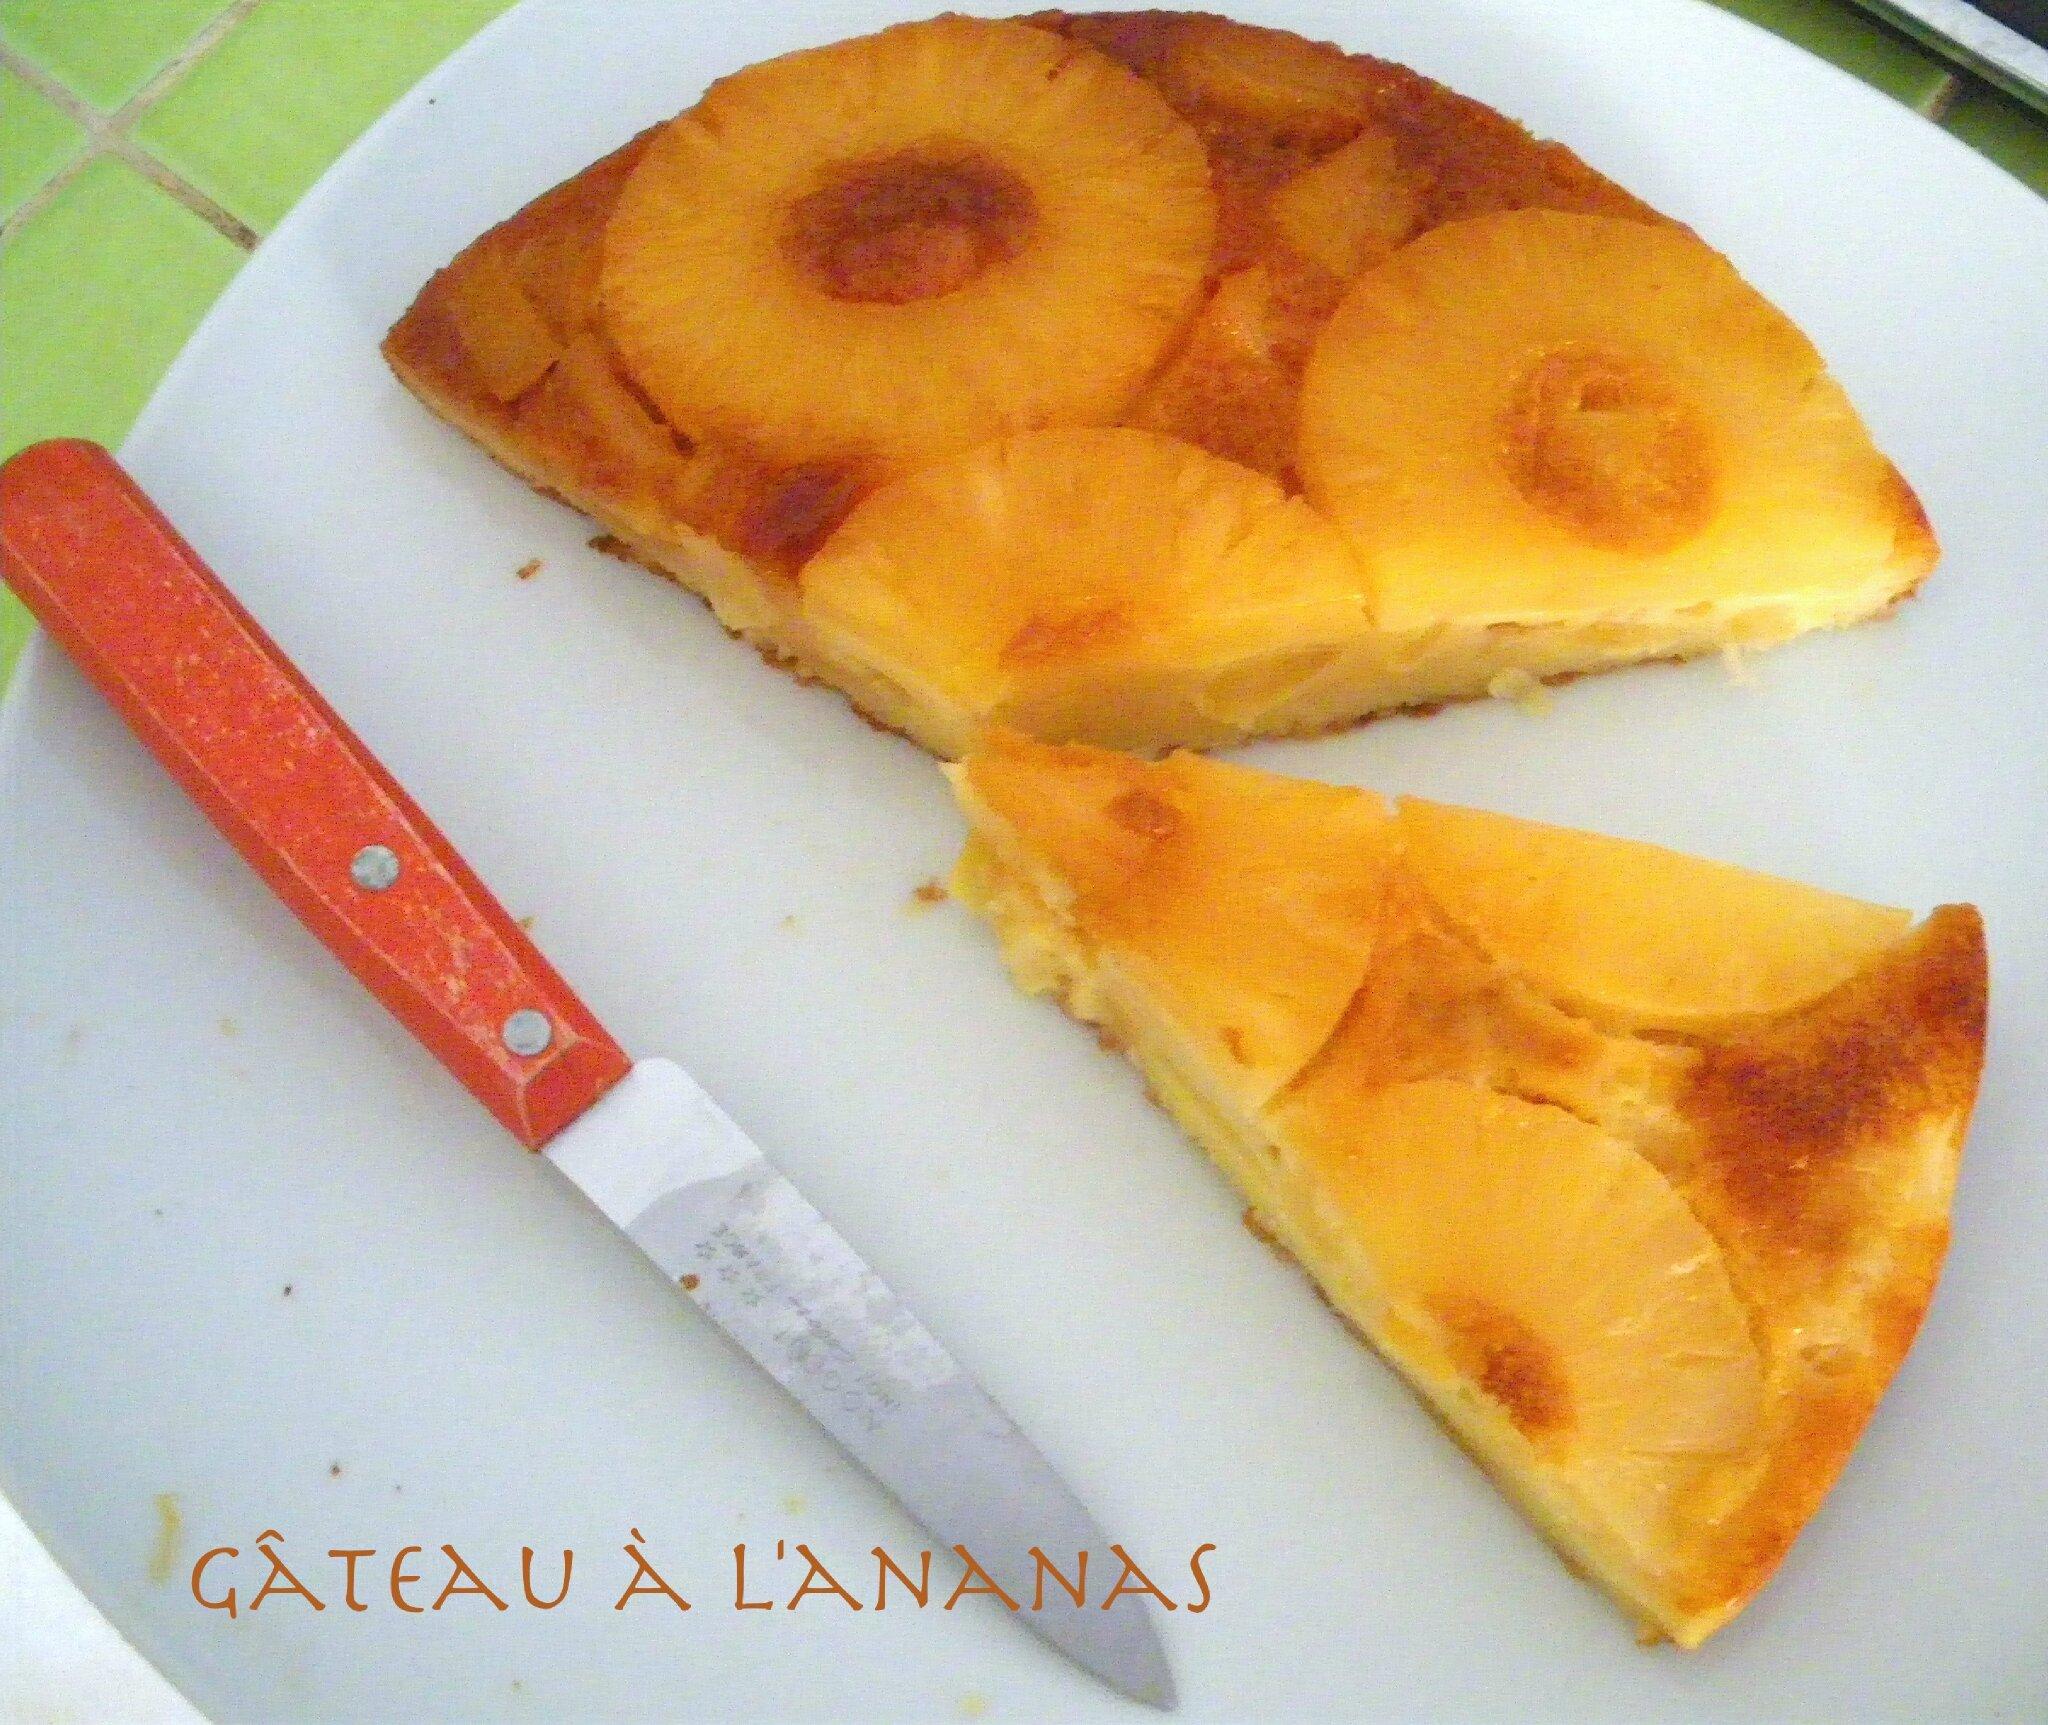 Gateau ananas seche